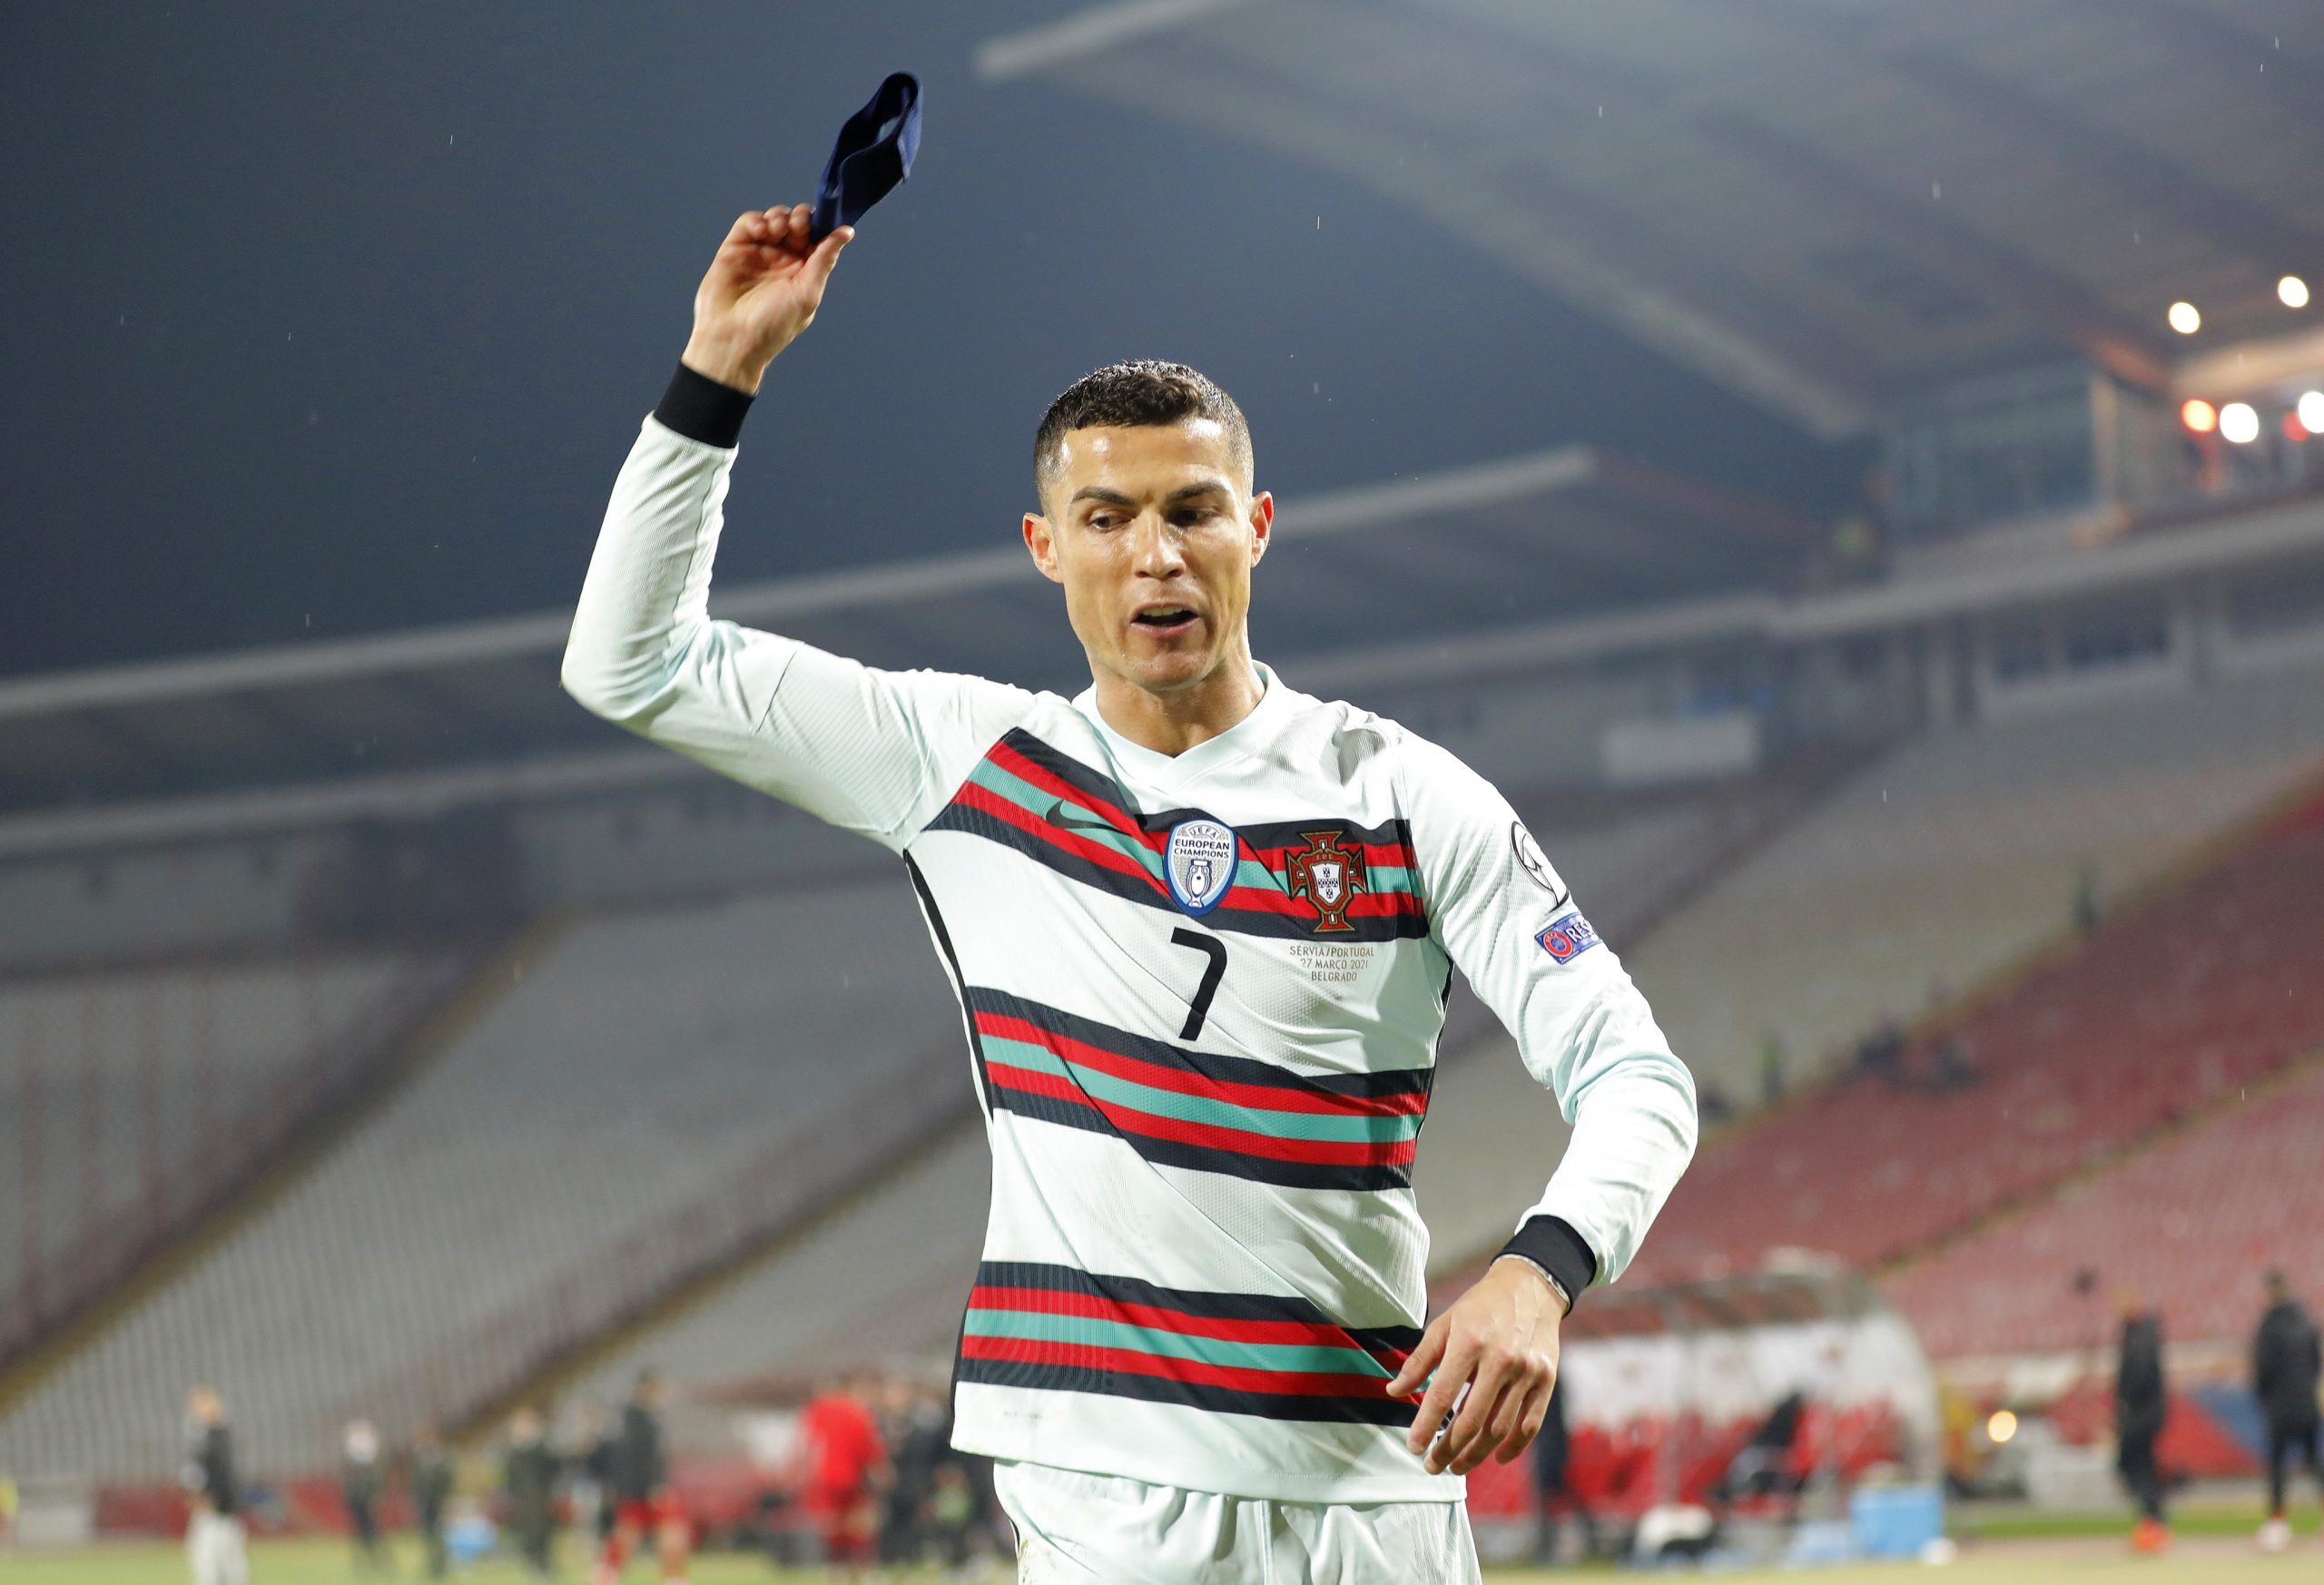 Cristiano Ronaldo, كريستيانو رونالدو, serbie vs portugal, 2022, coupe du monde Qatar 2022, غضب كريستيانو رونالدو, صربيا و البرتغال, قطر 2022